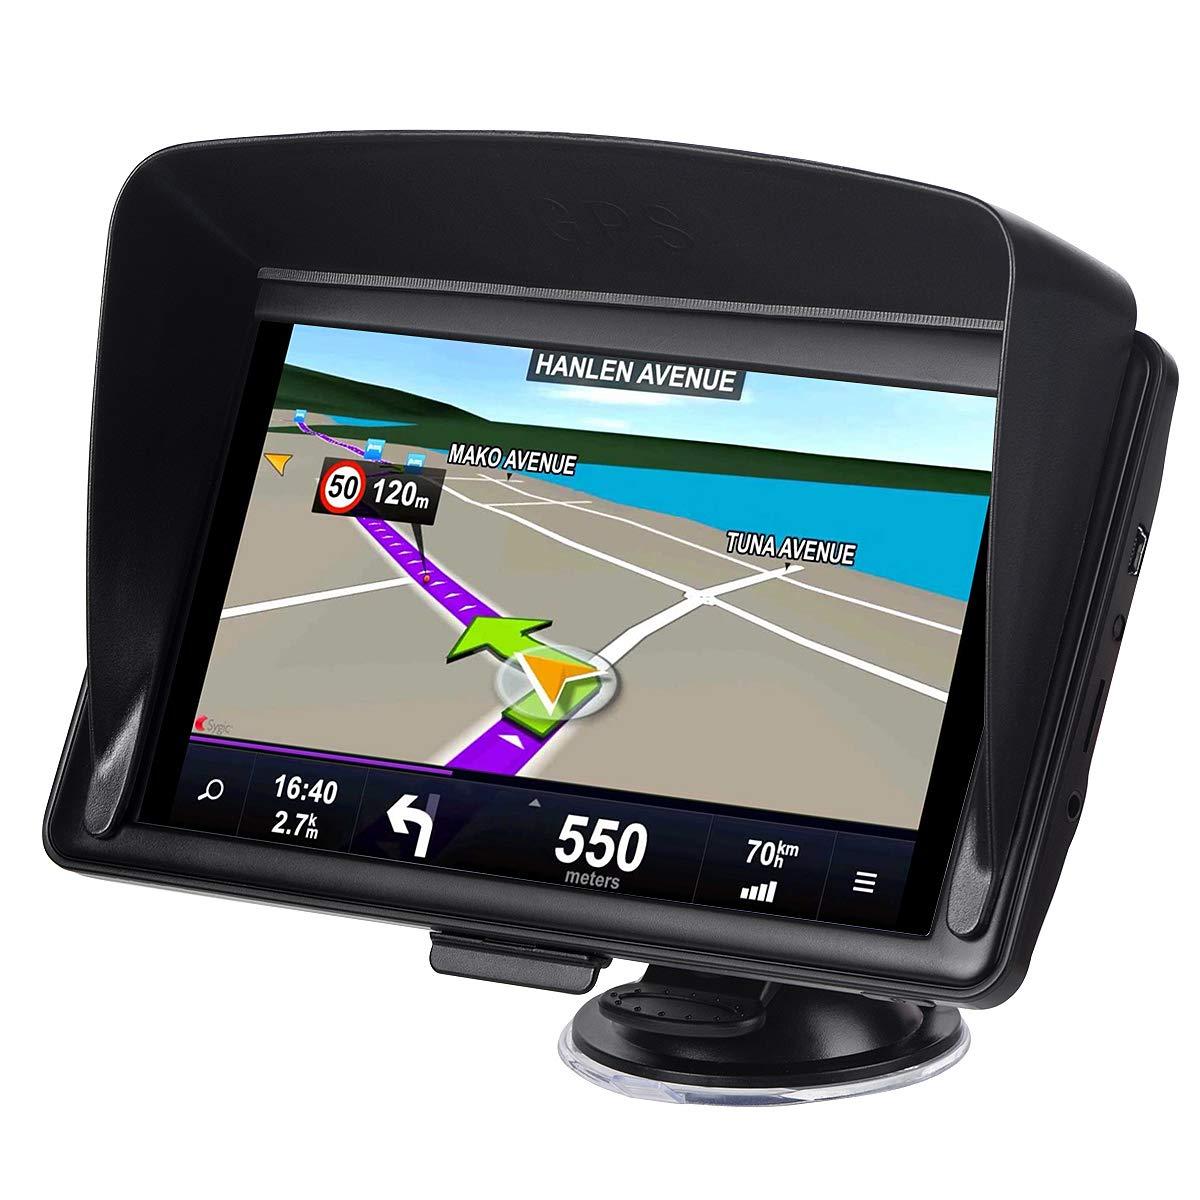 GPS for Car 7 inches 8GB Lifetime Map Update Spoken Turn-to-turn Navigation System for Cars Vehicle GPS Navigator SAT NAV